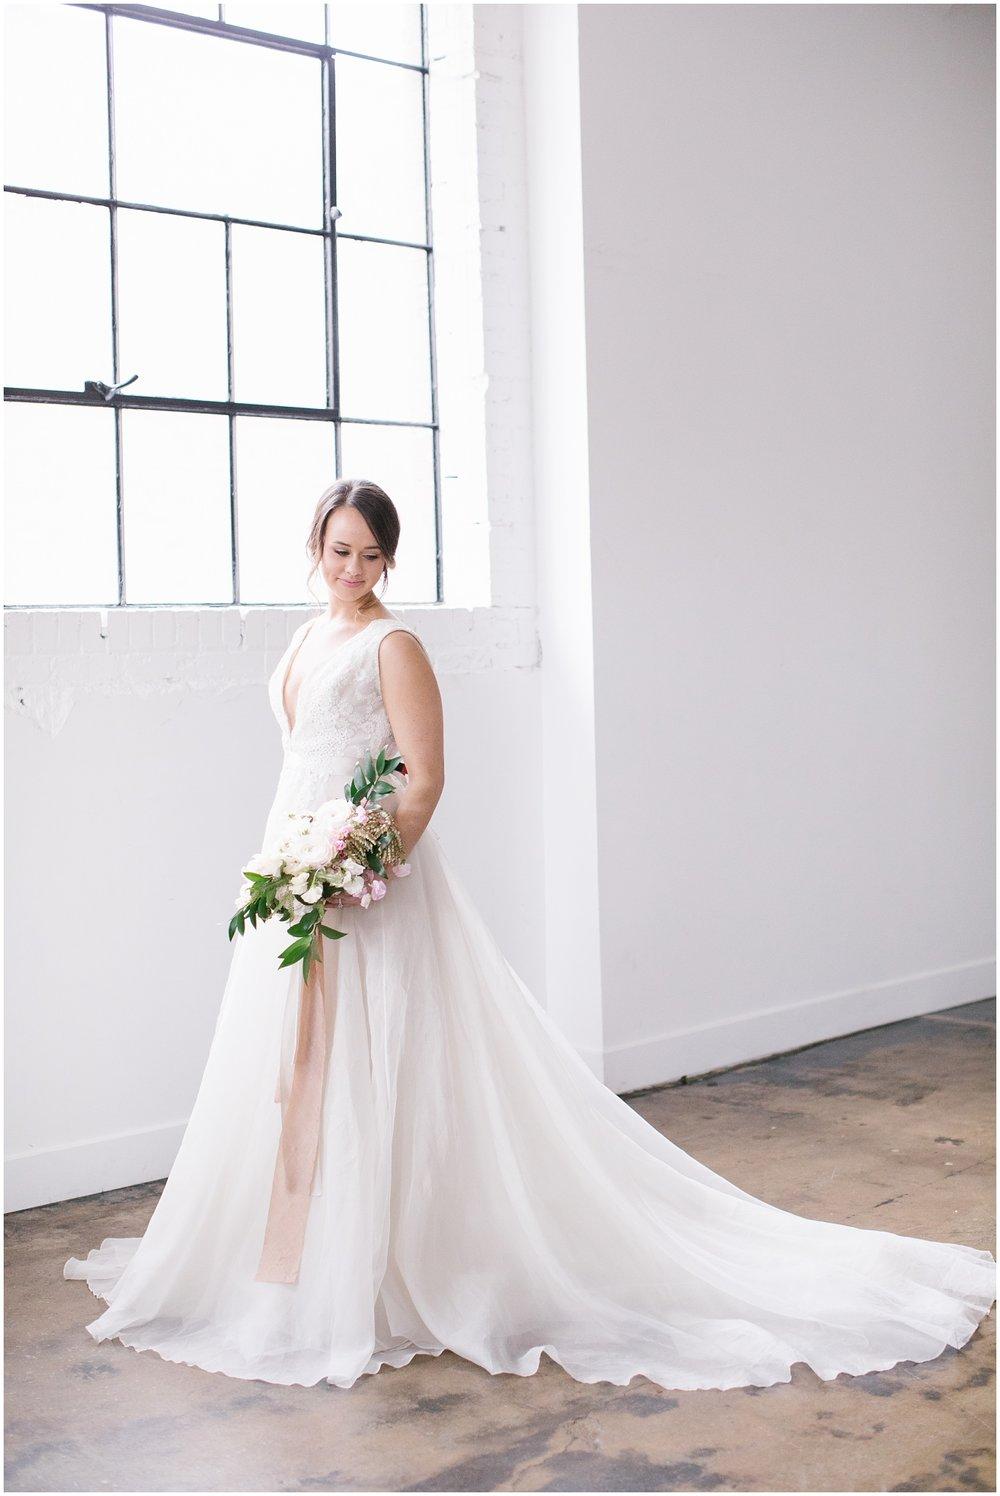 Styled Shoot2-17-32_Lizzie-B-Imagery-Utah-Wedding-Photographer-Park-City-Salt-Lake-City-Charcoal-Loft-Studio.jpg